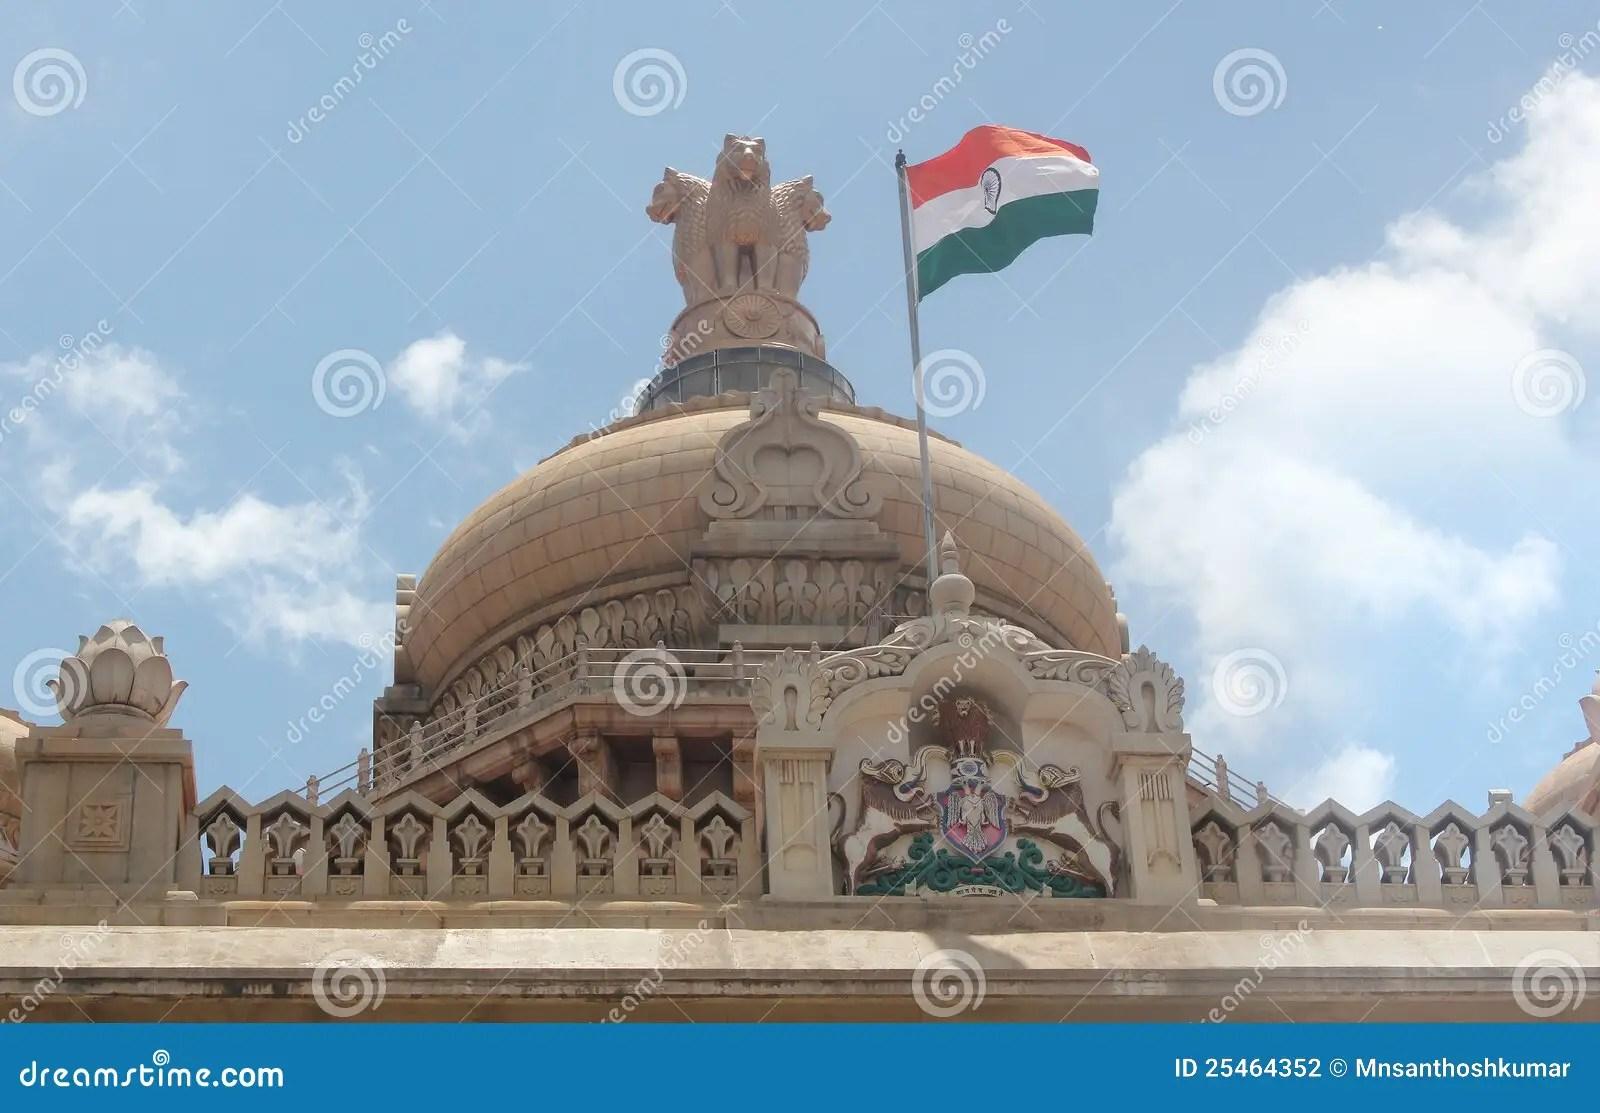 Indian Flag Animation Wallpaper Indian Flag On Vidhana Soudha Travel Bangalore Stock